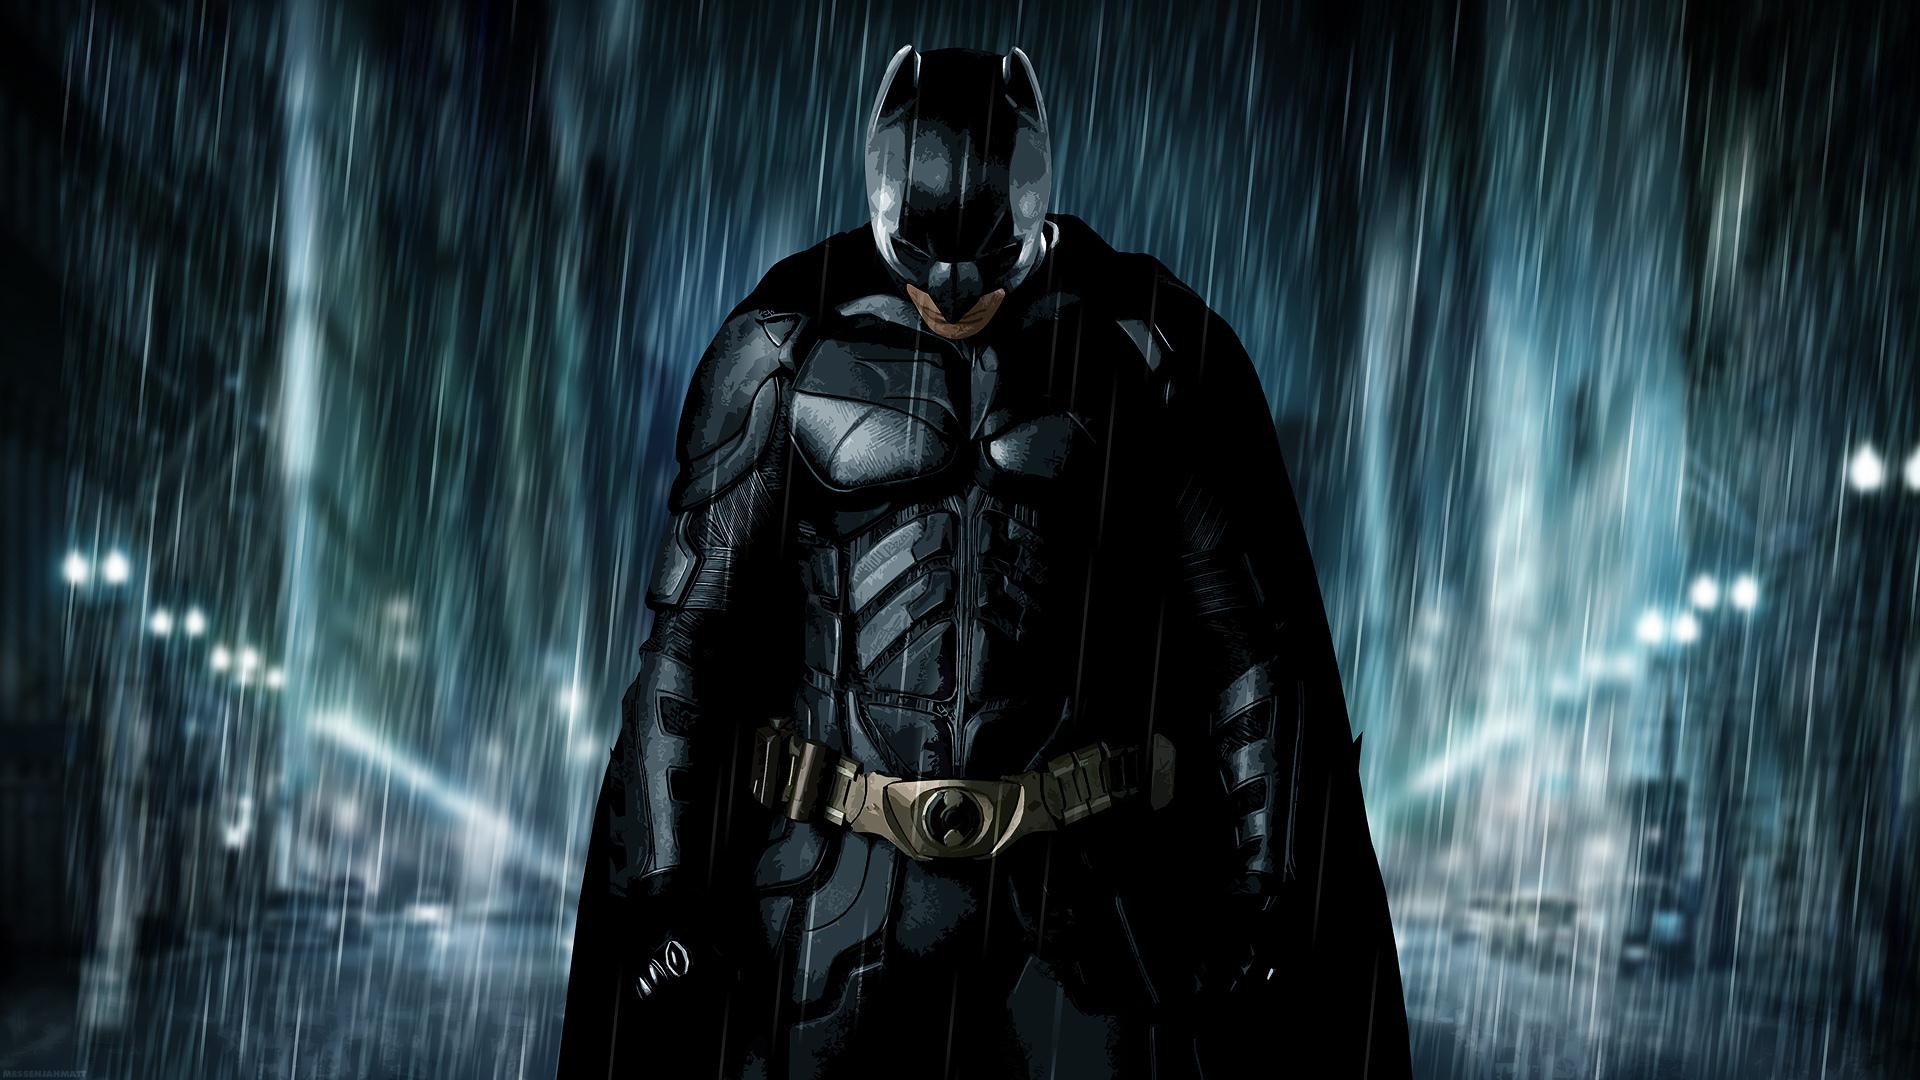 15109 download wallpaper Cinema, Men, Batman screensavers and pictures for free